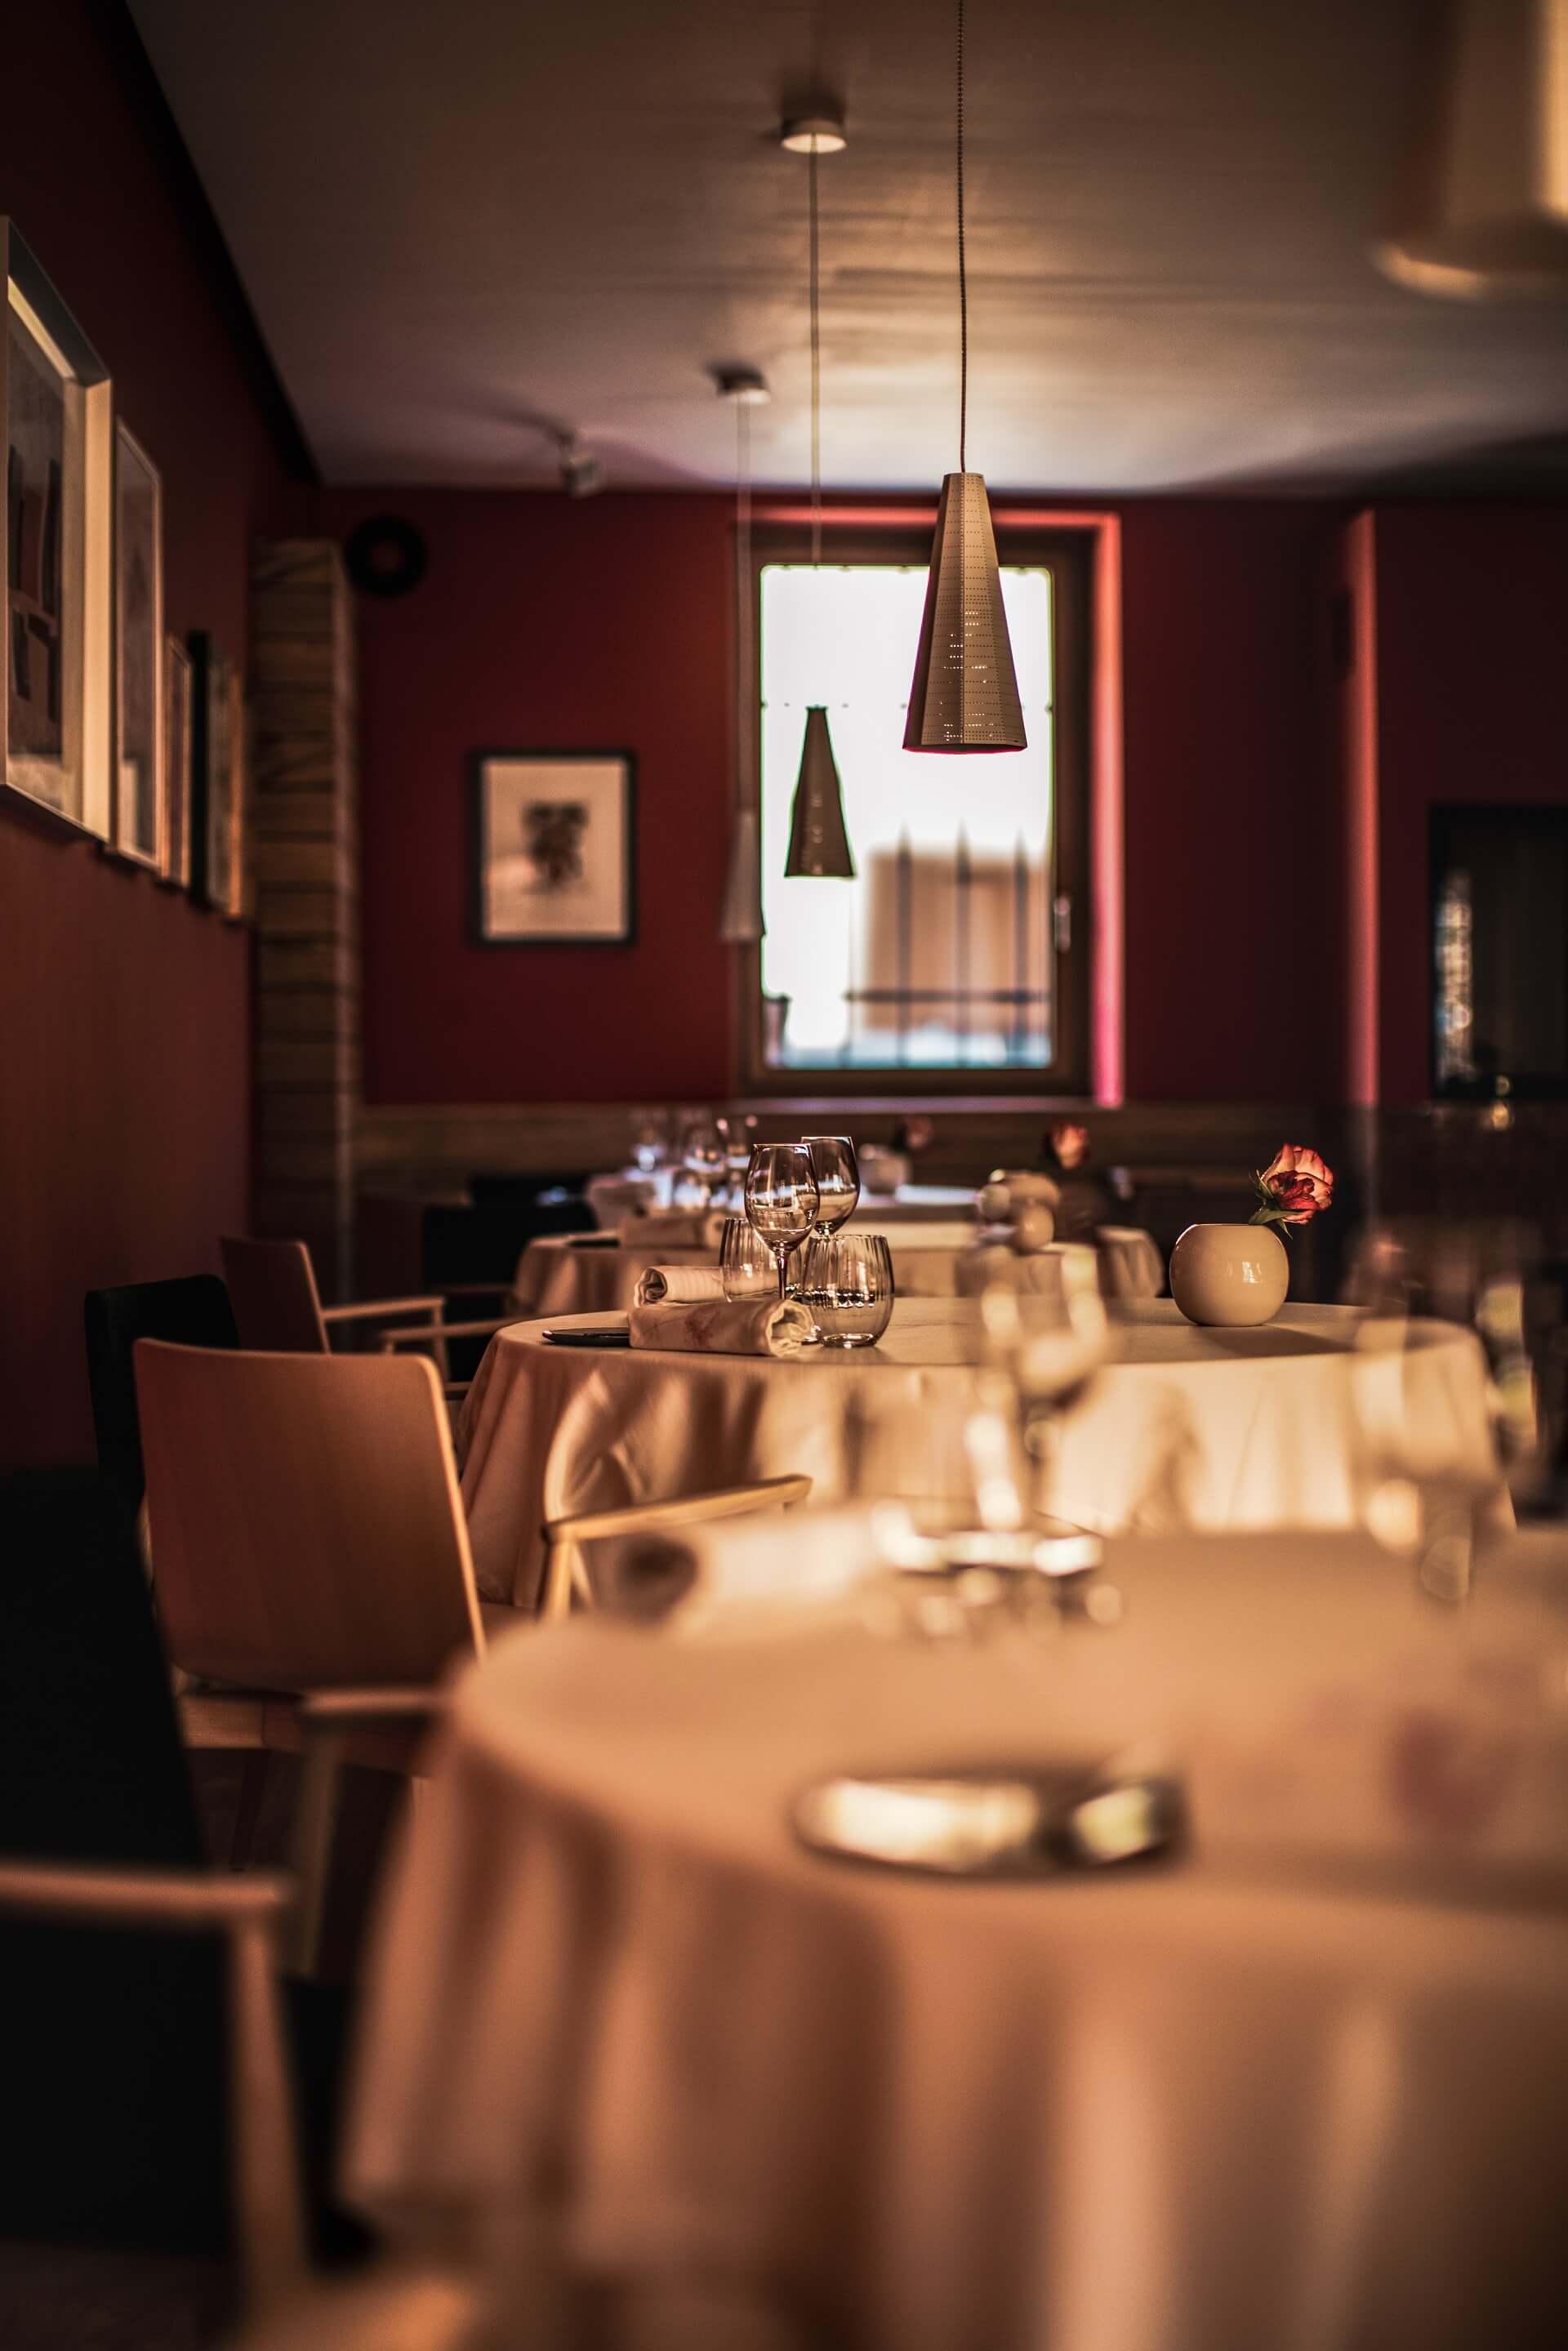 The family restaurant Hiša Franko Netflix's Chef's Table series